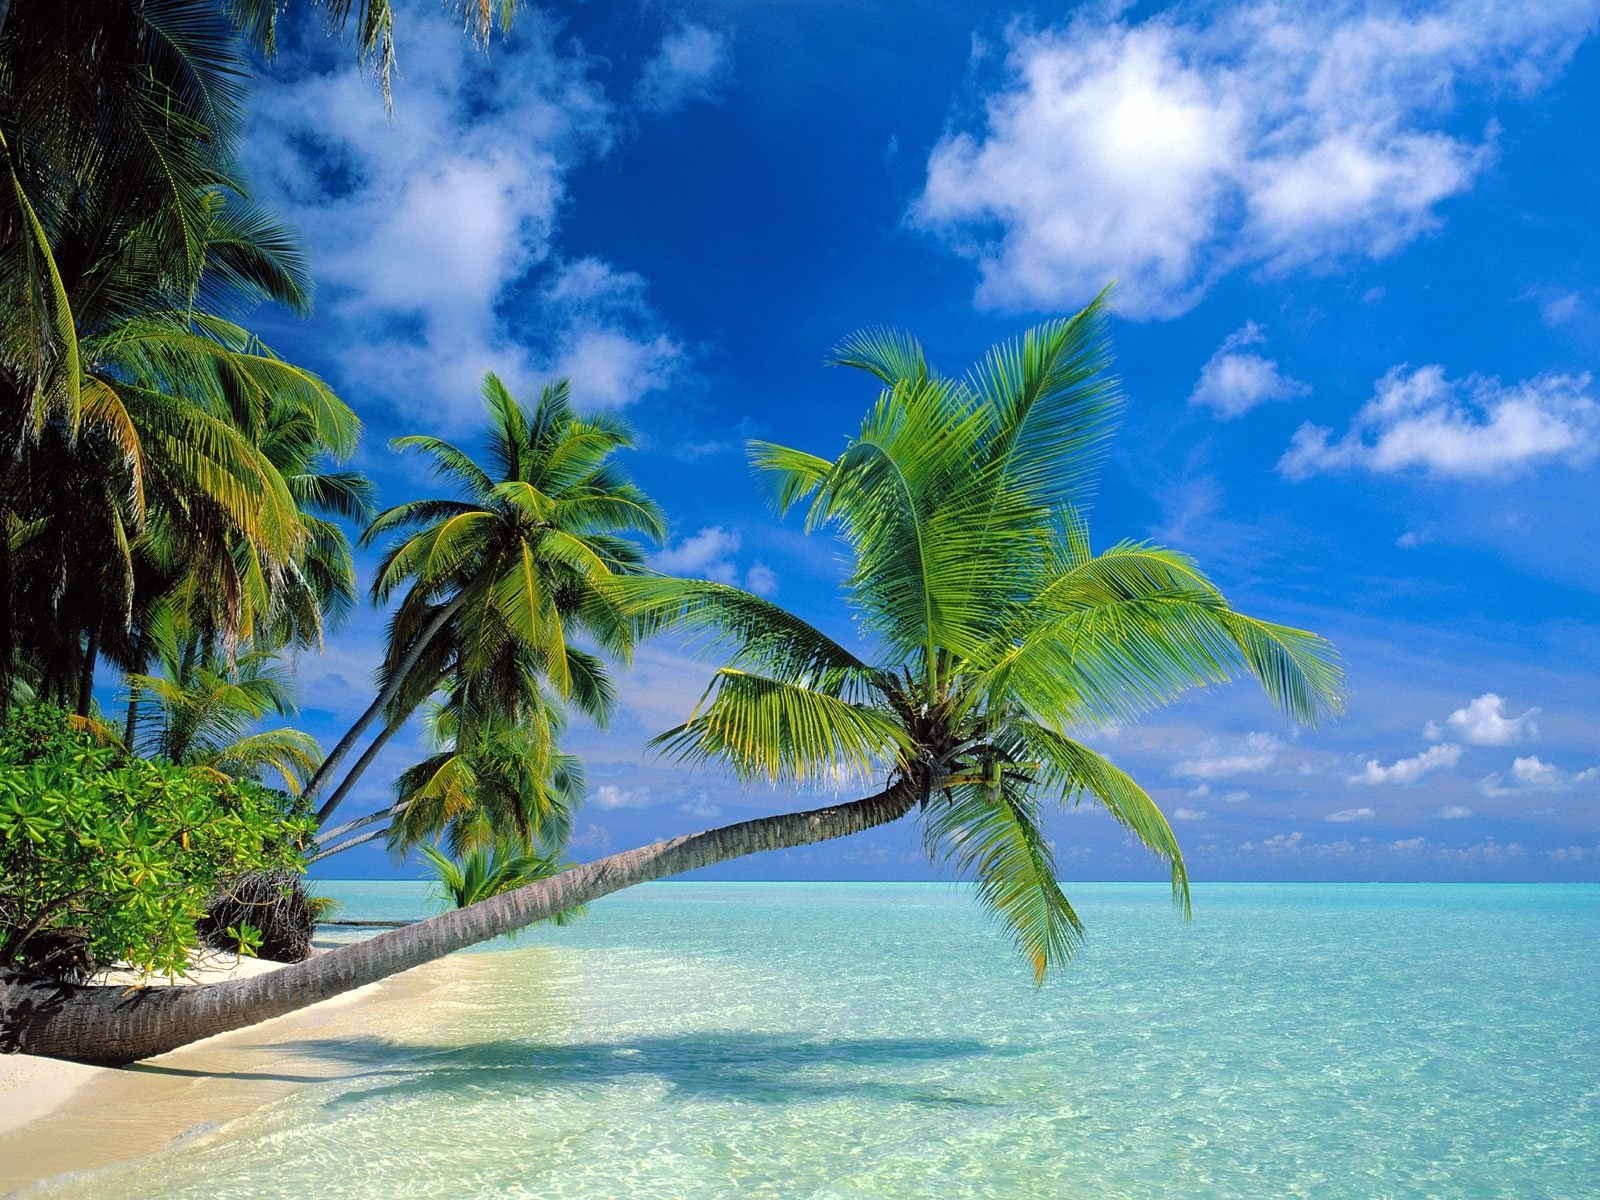 Tierra - Playa  - 1440x900 - Spring - Splendid Fondo de Pantalla